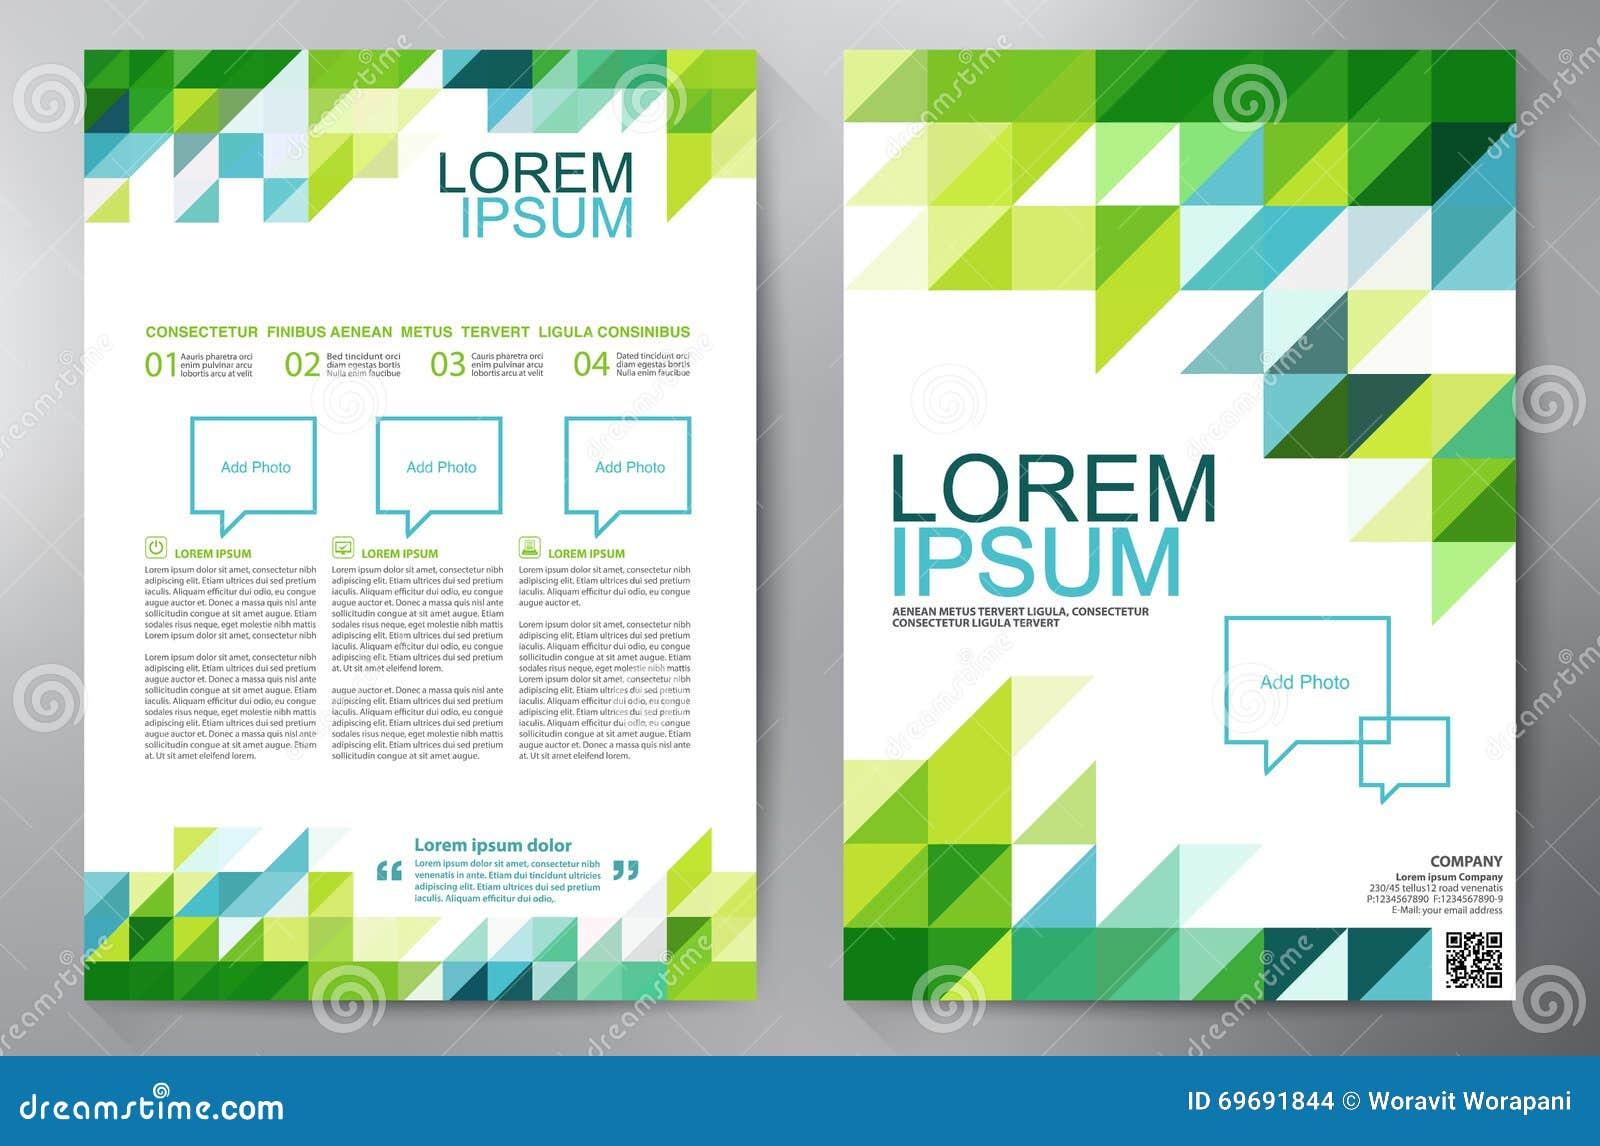 Brochure Design A4 Template  Stock Vector - Illustration of